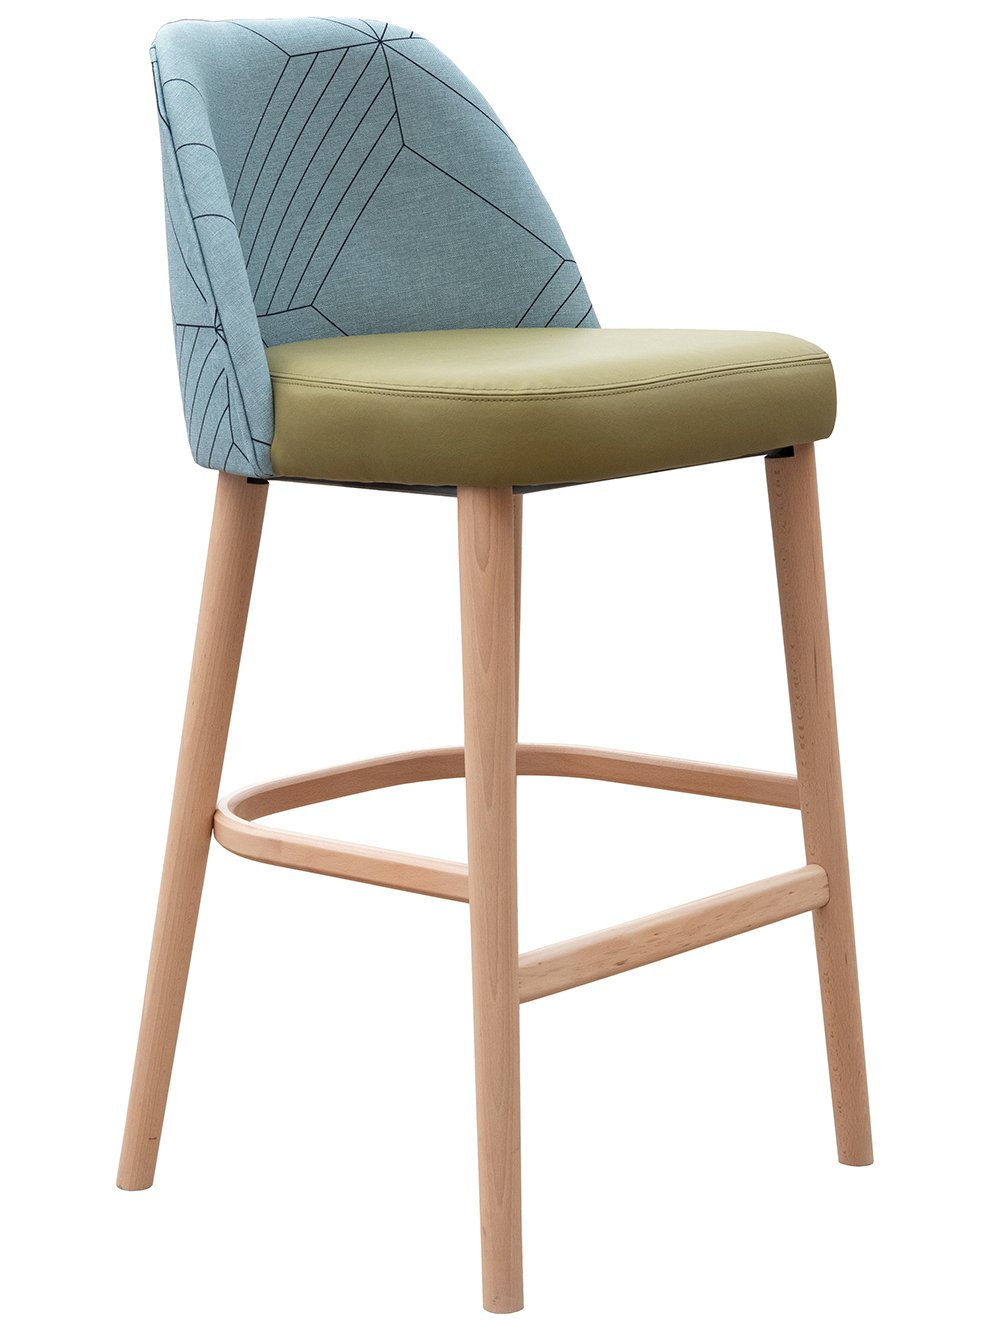 Calm high stool